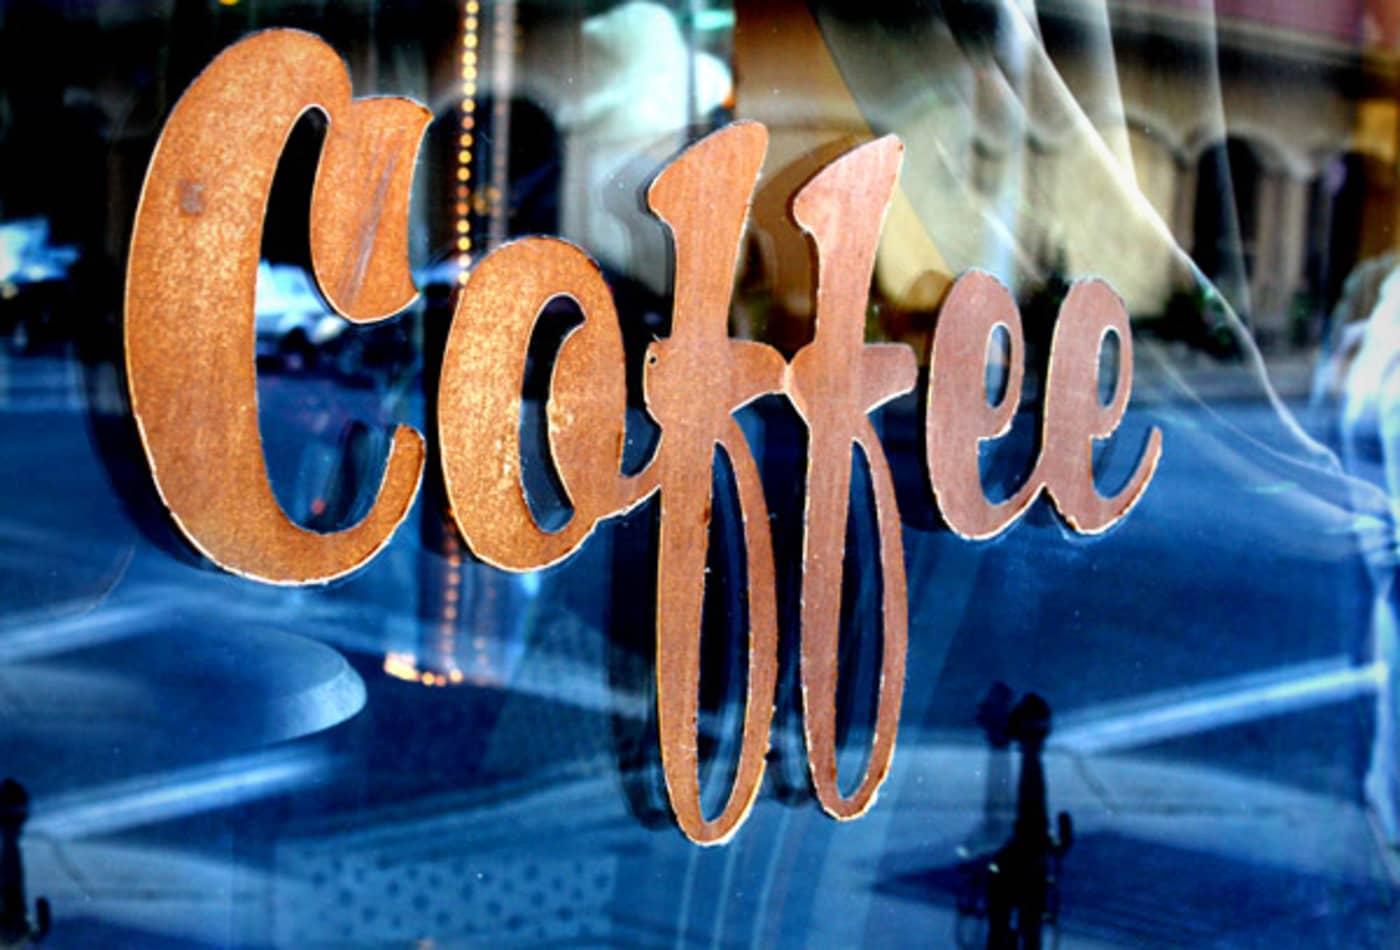 most_caffeinated_cities_spokane.jpg